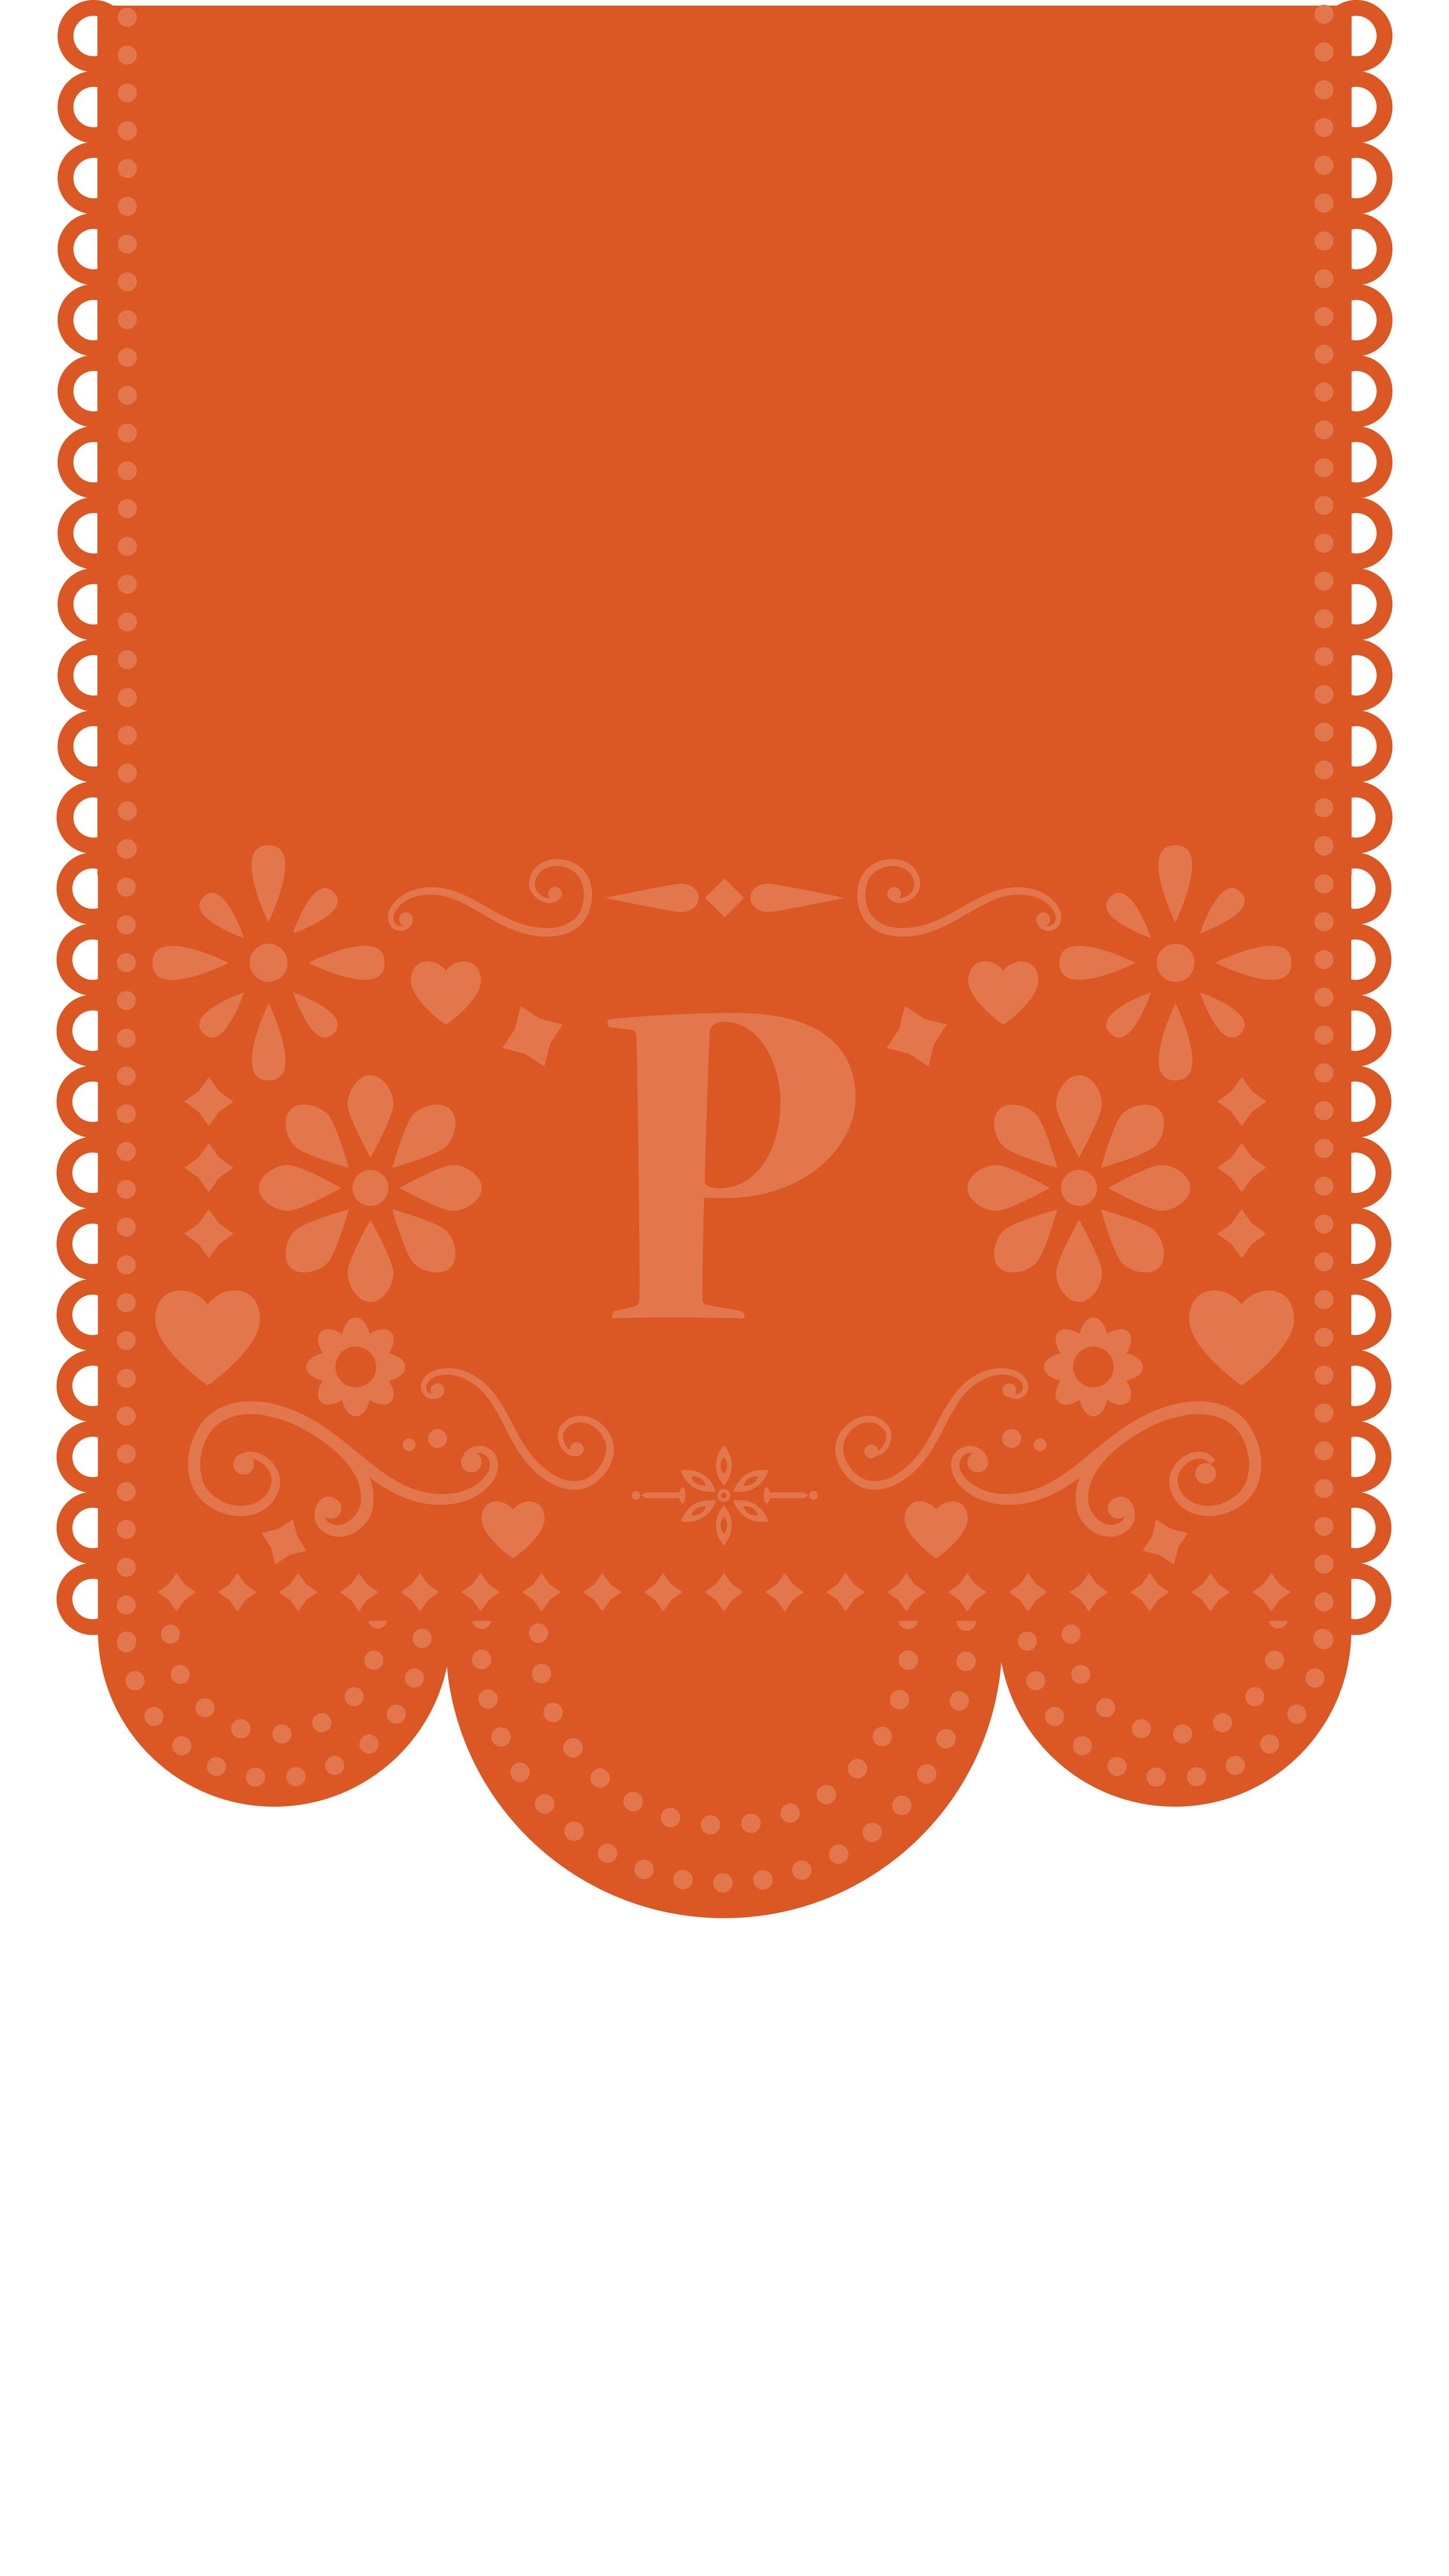 p-fiesta-banner.png